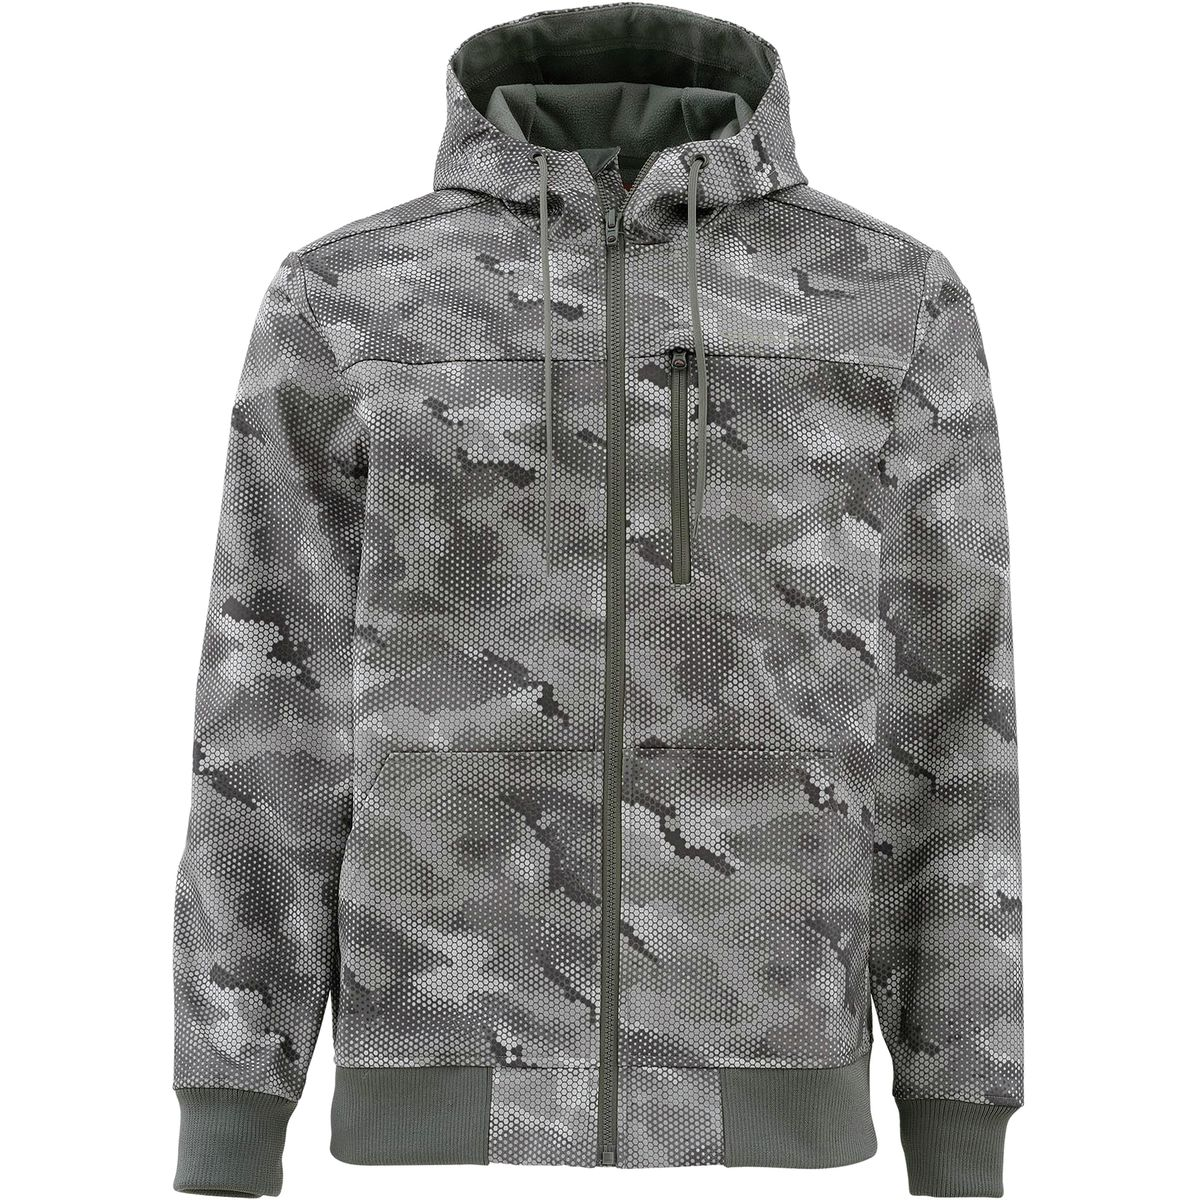 Simms Rogue Hooded Fleece Jacket - Men